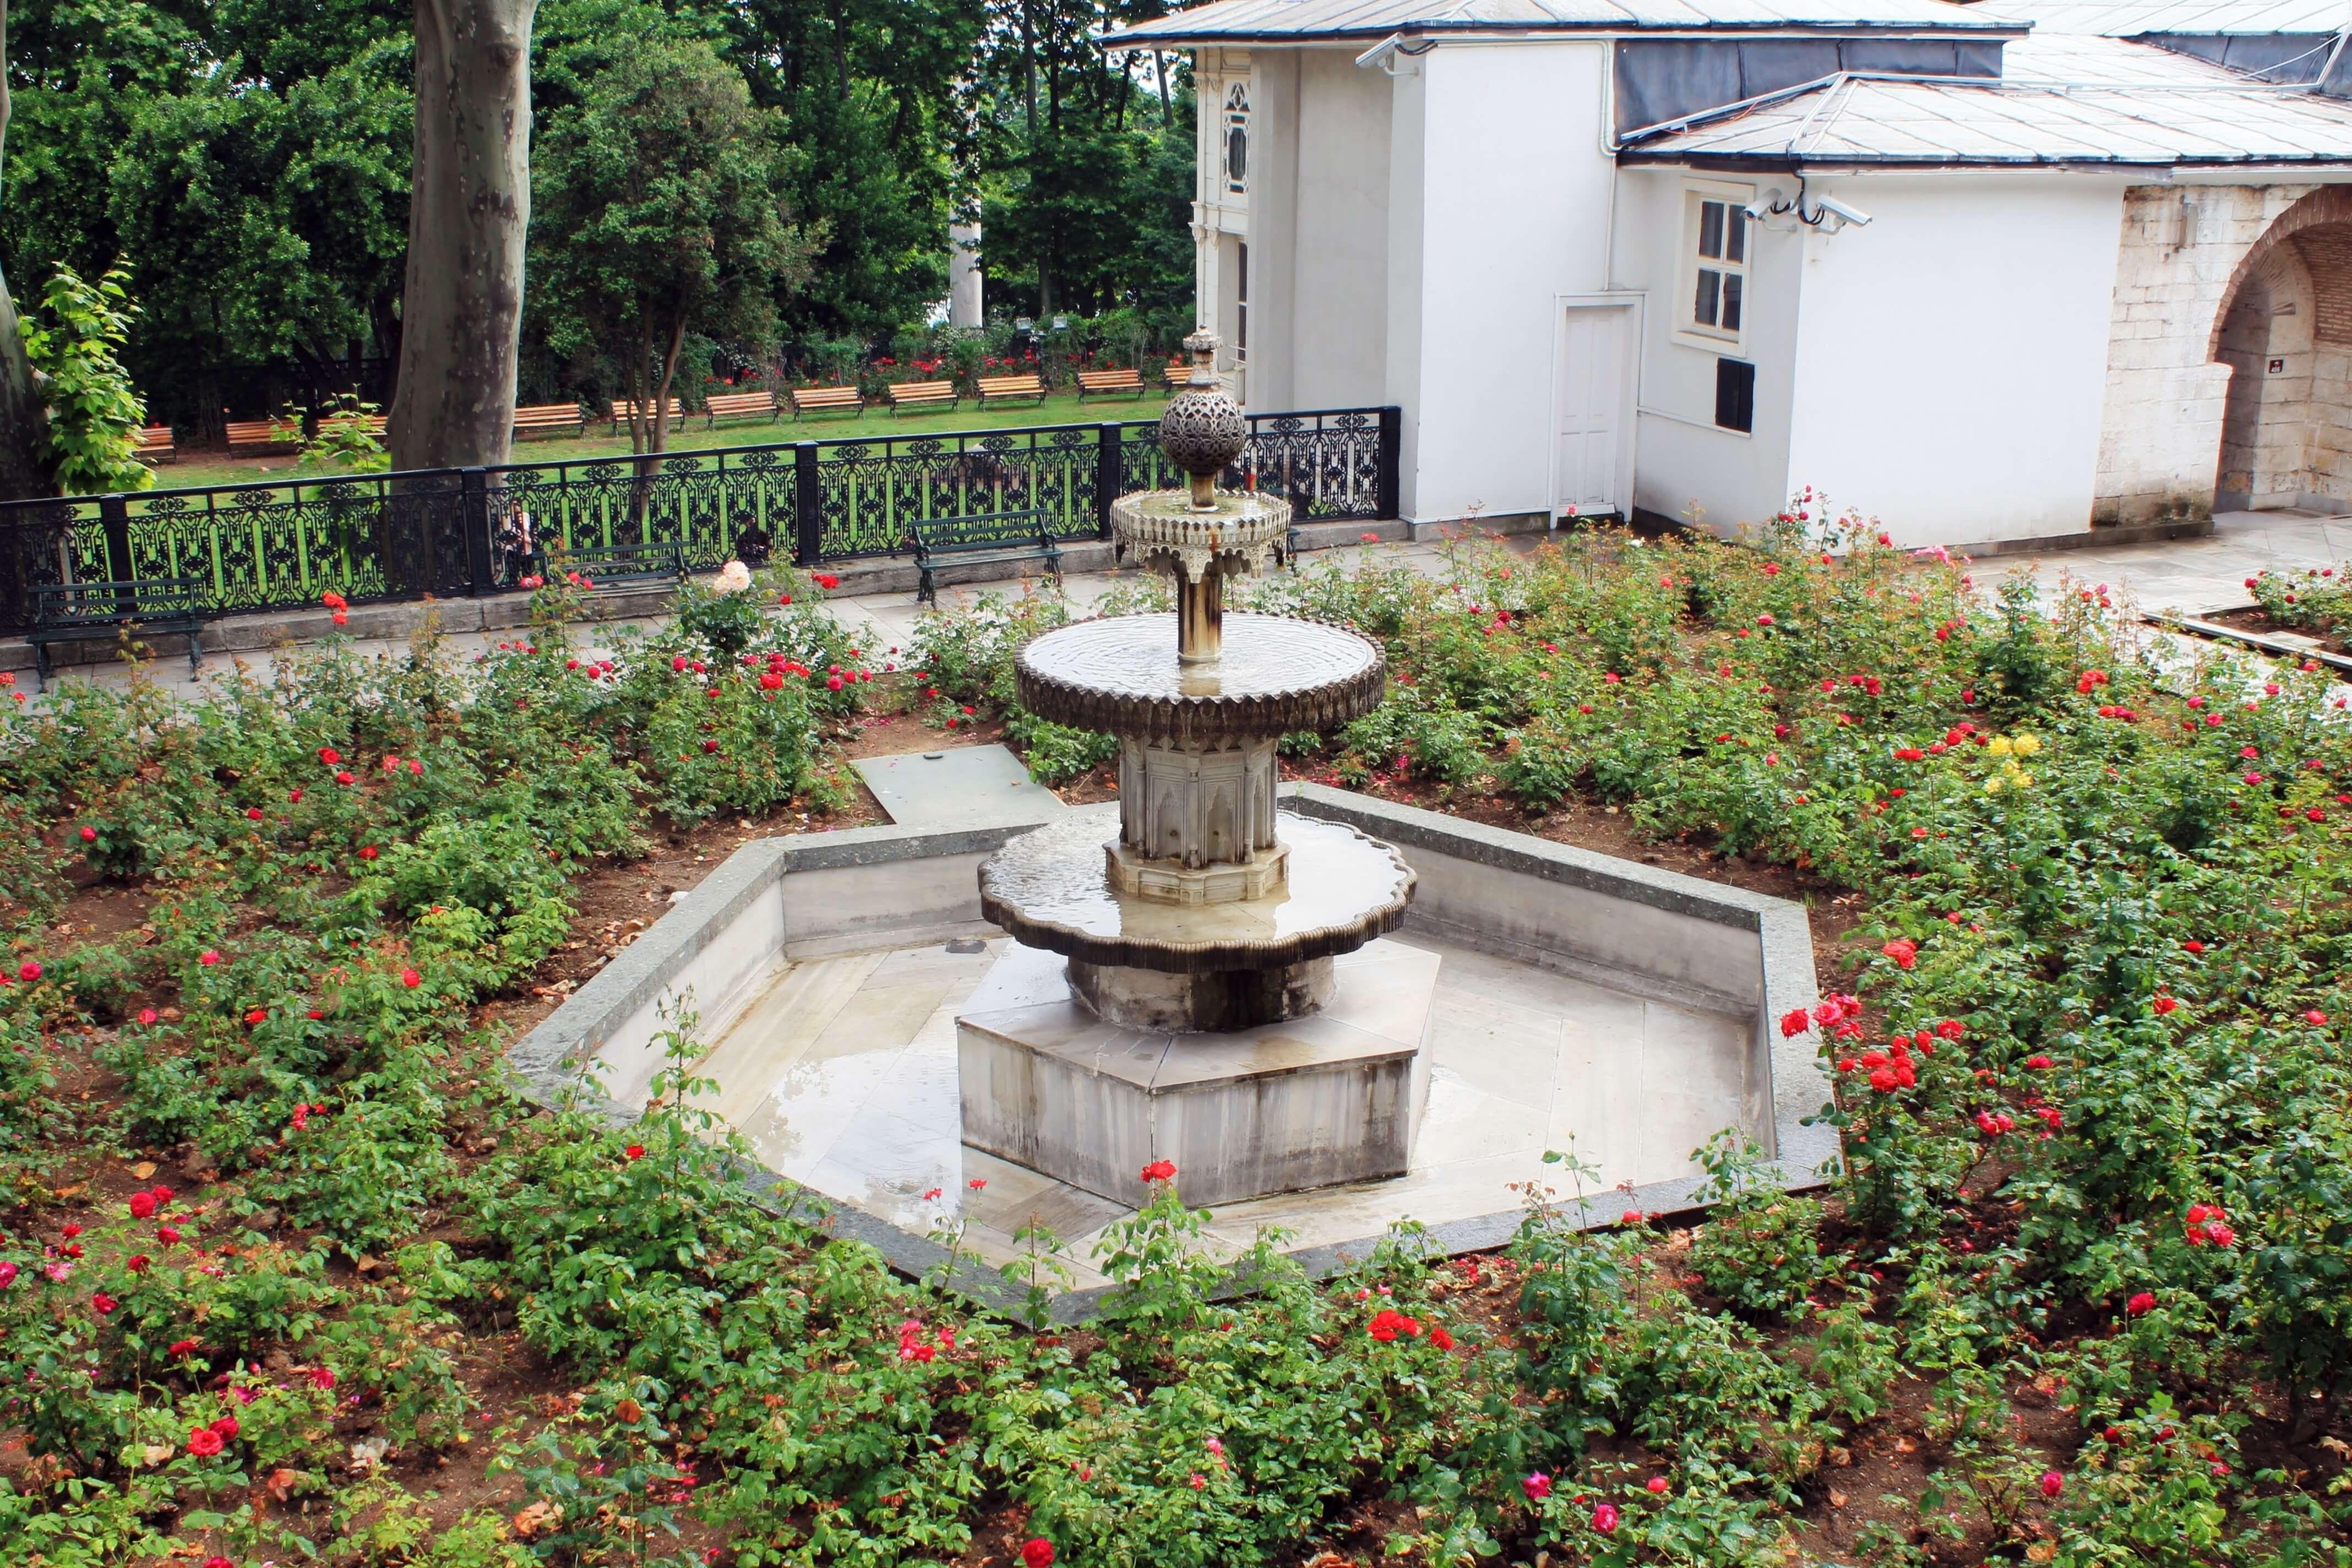 Kara Mustafa Pasha Fountain & Kiosk_Topkapi 4th Courtyard